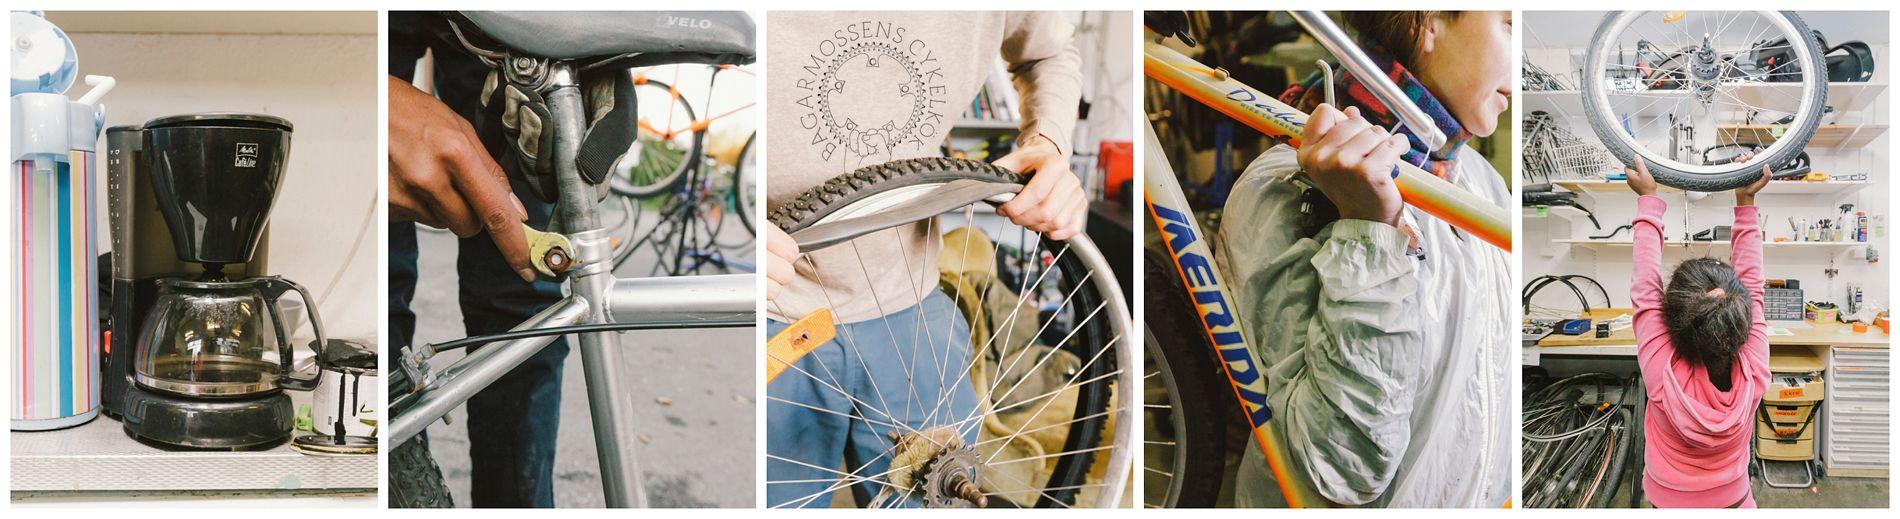 Bagarmossens cykelkök kollage